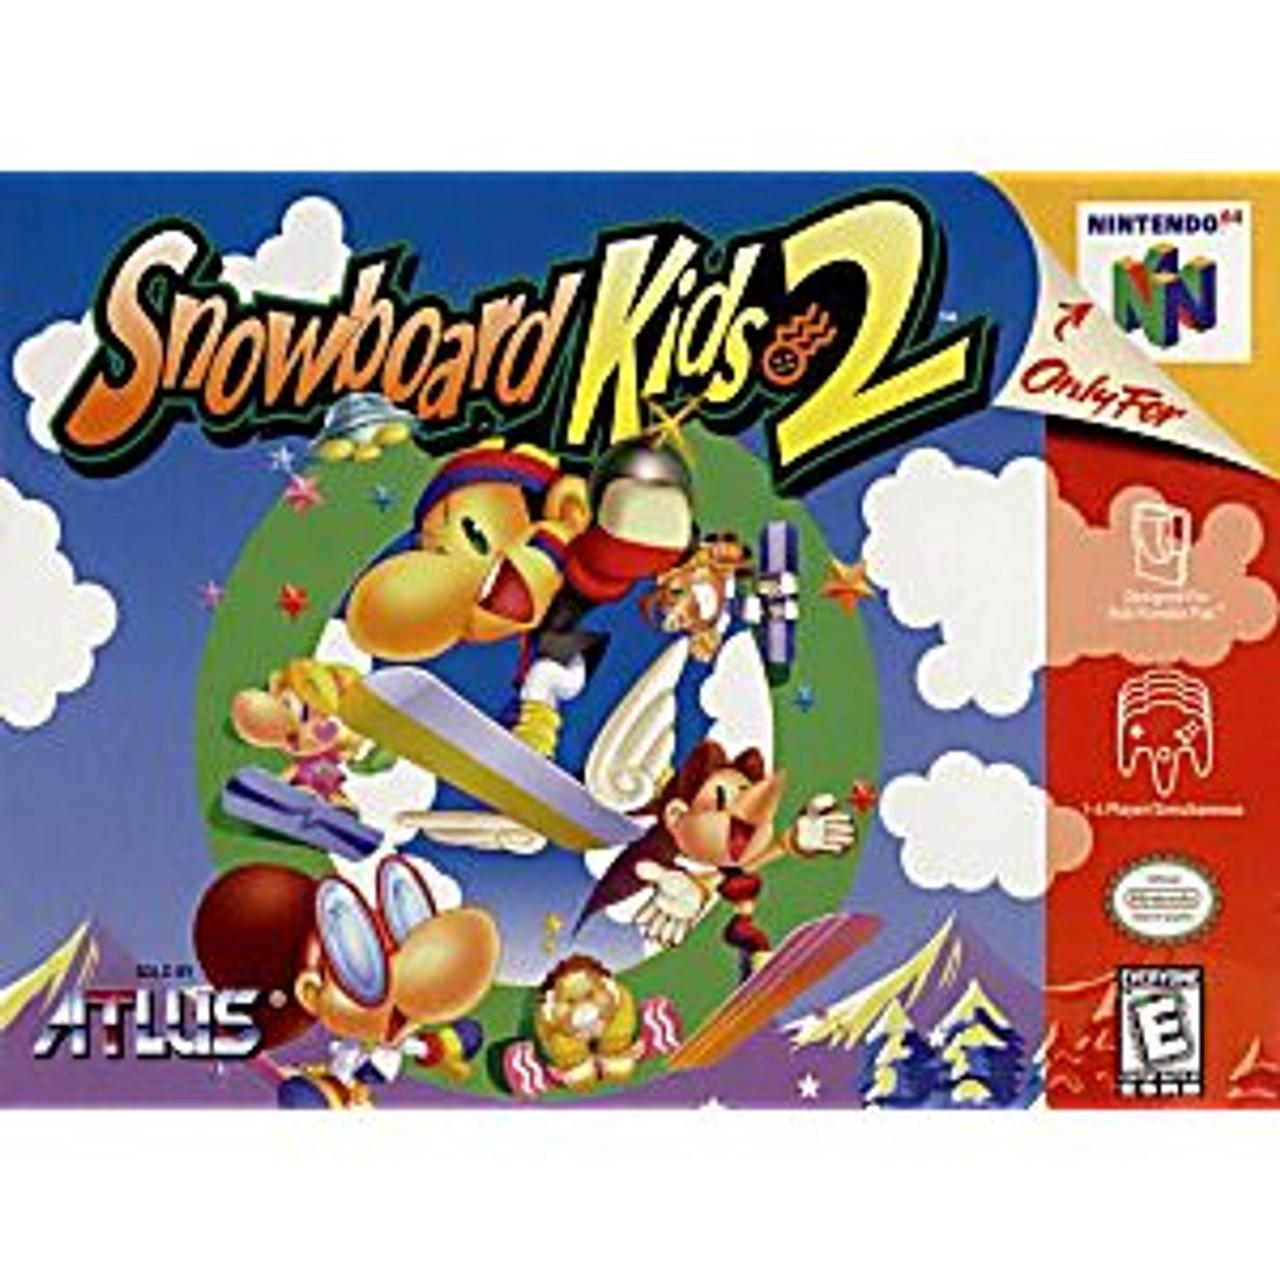 SNOWBOARD KIDS 2 - N64